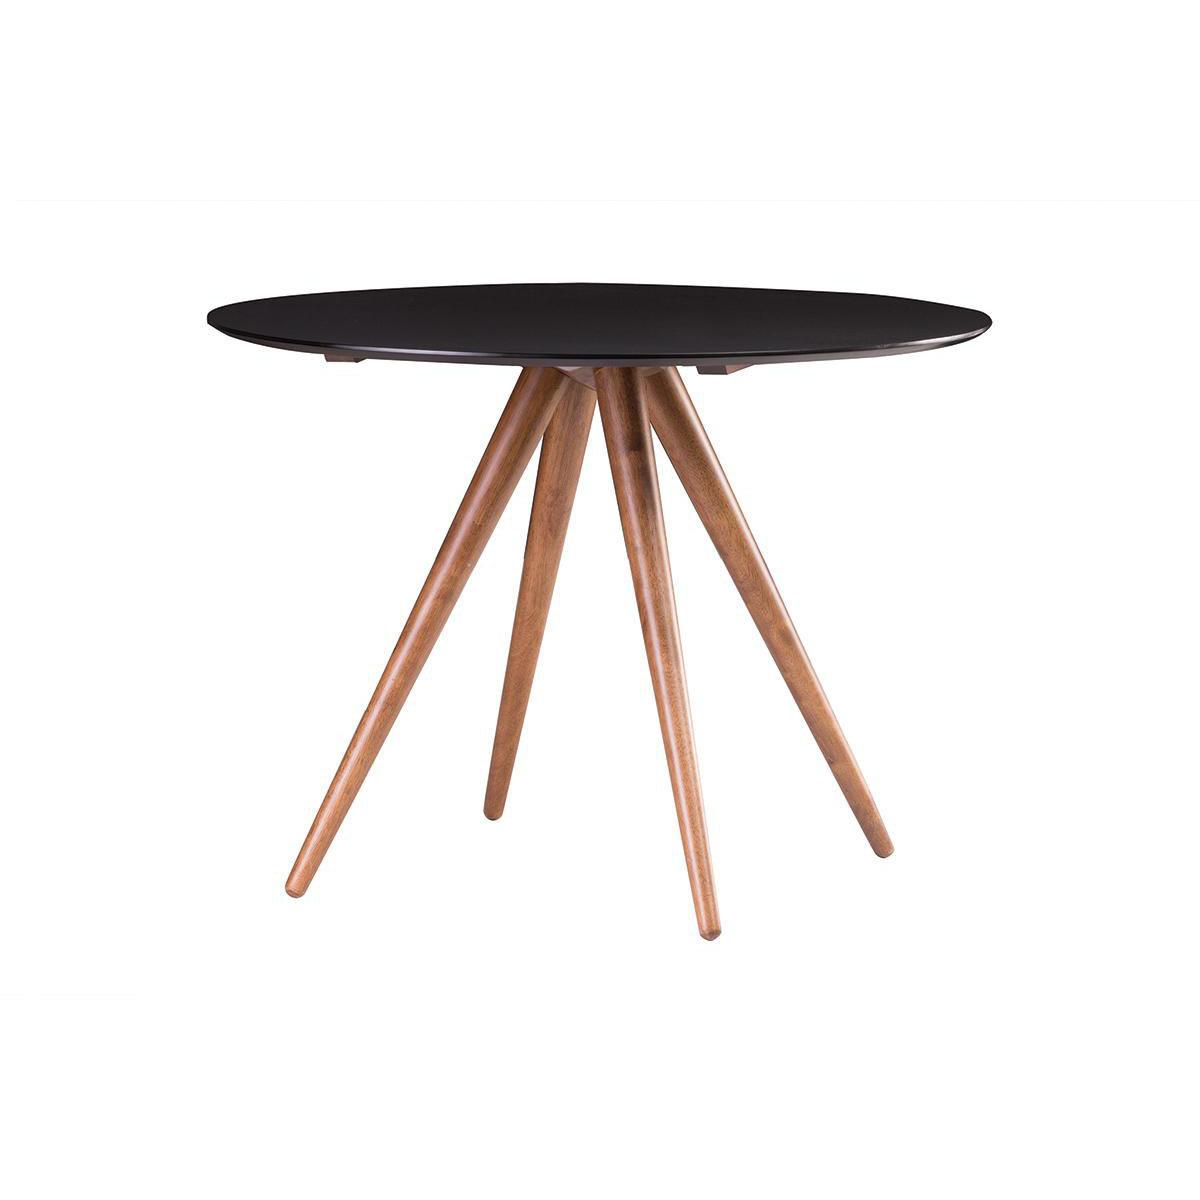 manger table ronde manger table avec ronde 1TFJc3lK